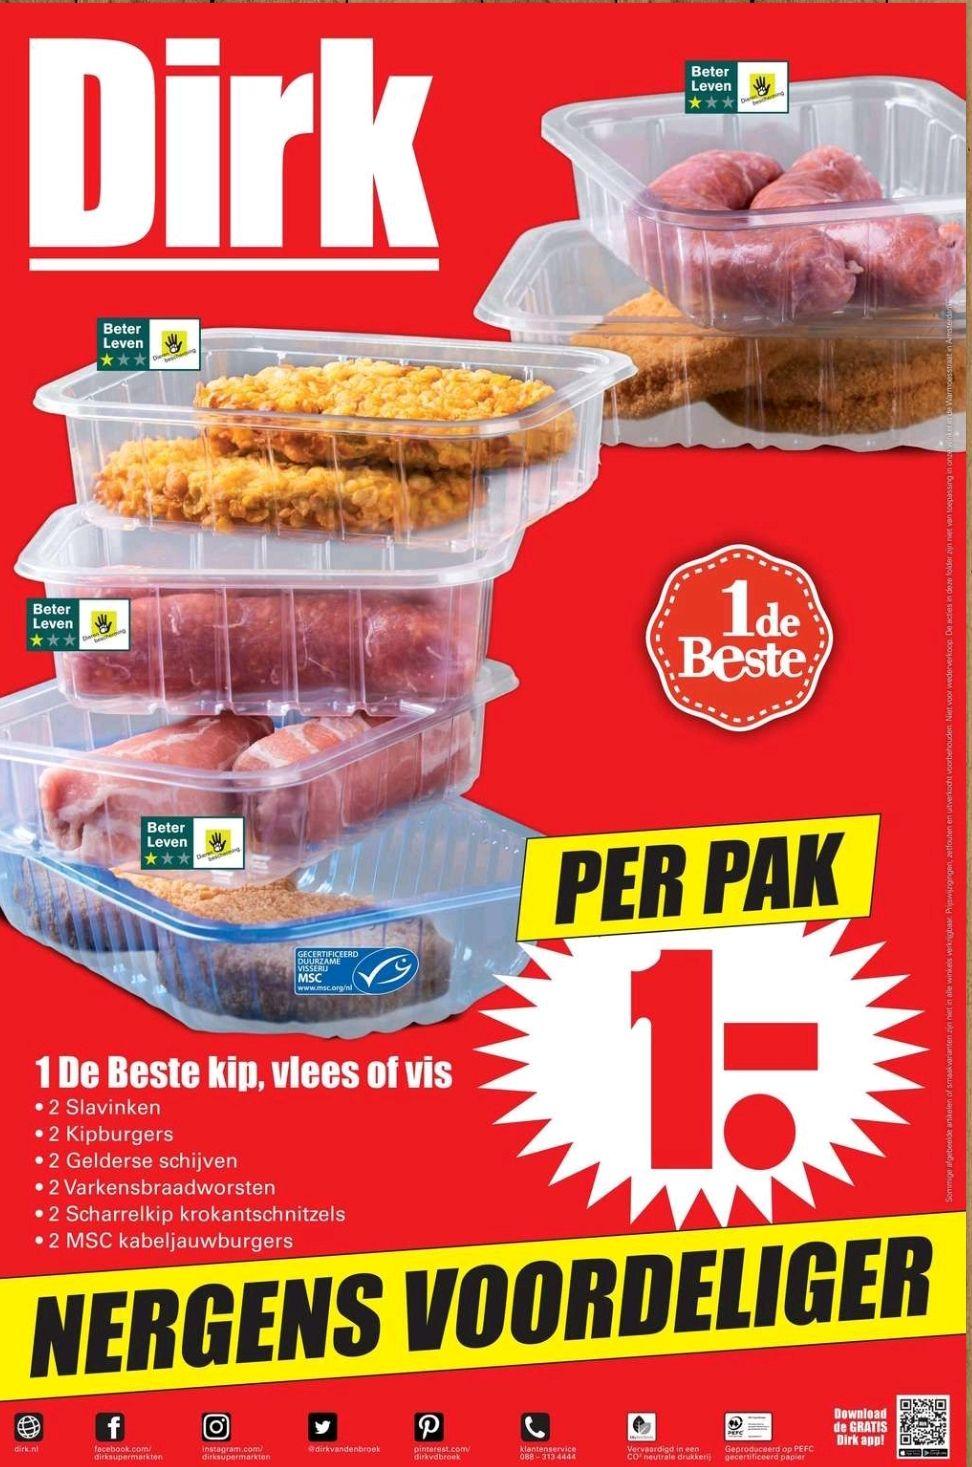 Bij Dirk: Kip, vlees of vis 1 euro per pak